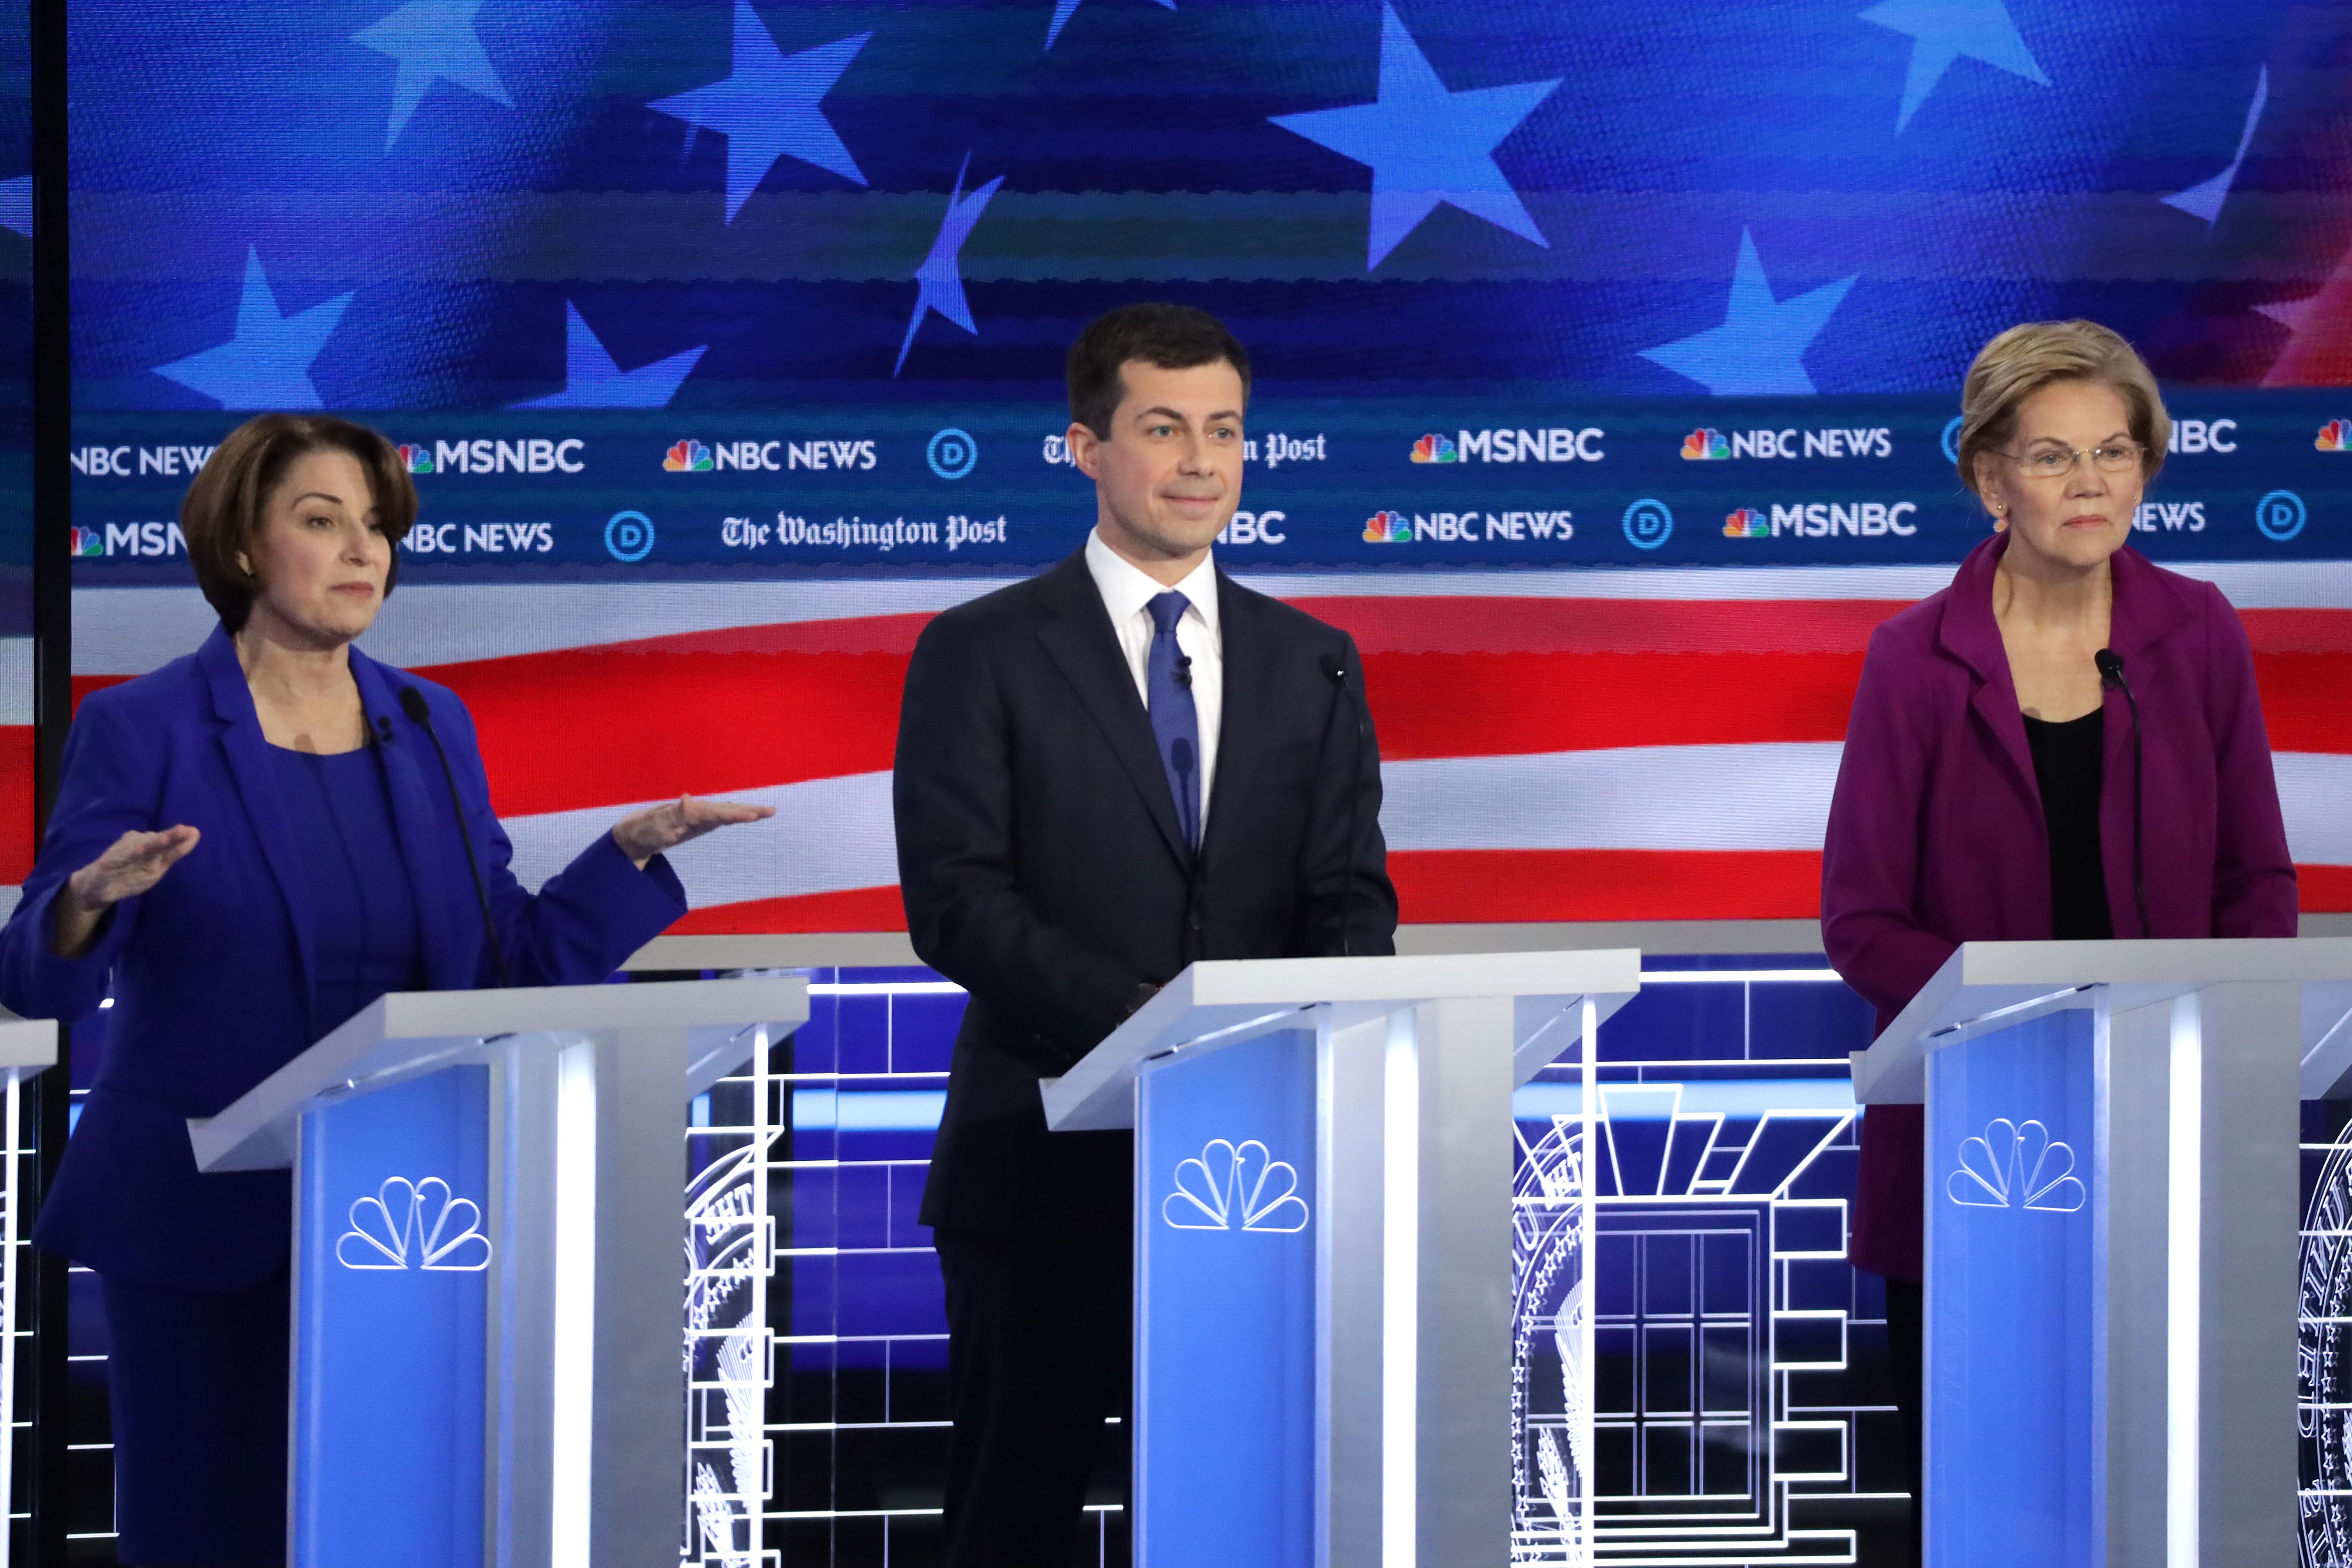 Democratic presidential candidates Sen. Amy Klobuchar, D-Minn., South Bend Mayor Pete Buttigieg and Sen. Elizabeth Warren, D-MA, participate in the Democratic Presidential Debate on Nov. 20, 2019 in Atlanta, Georgia.